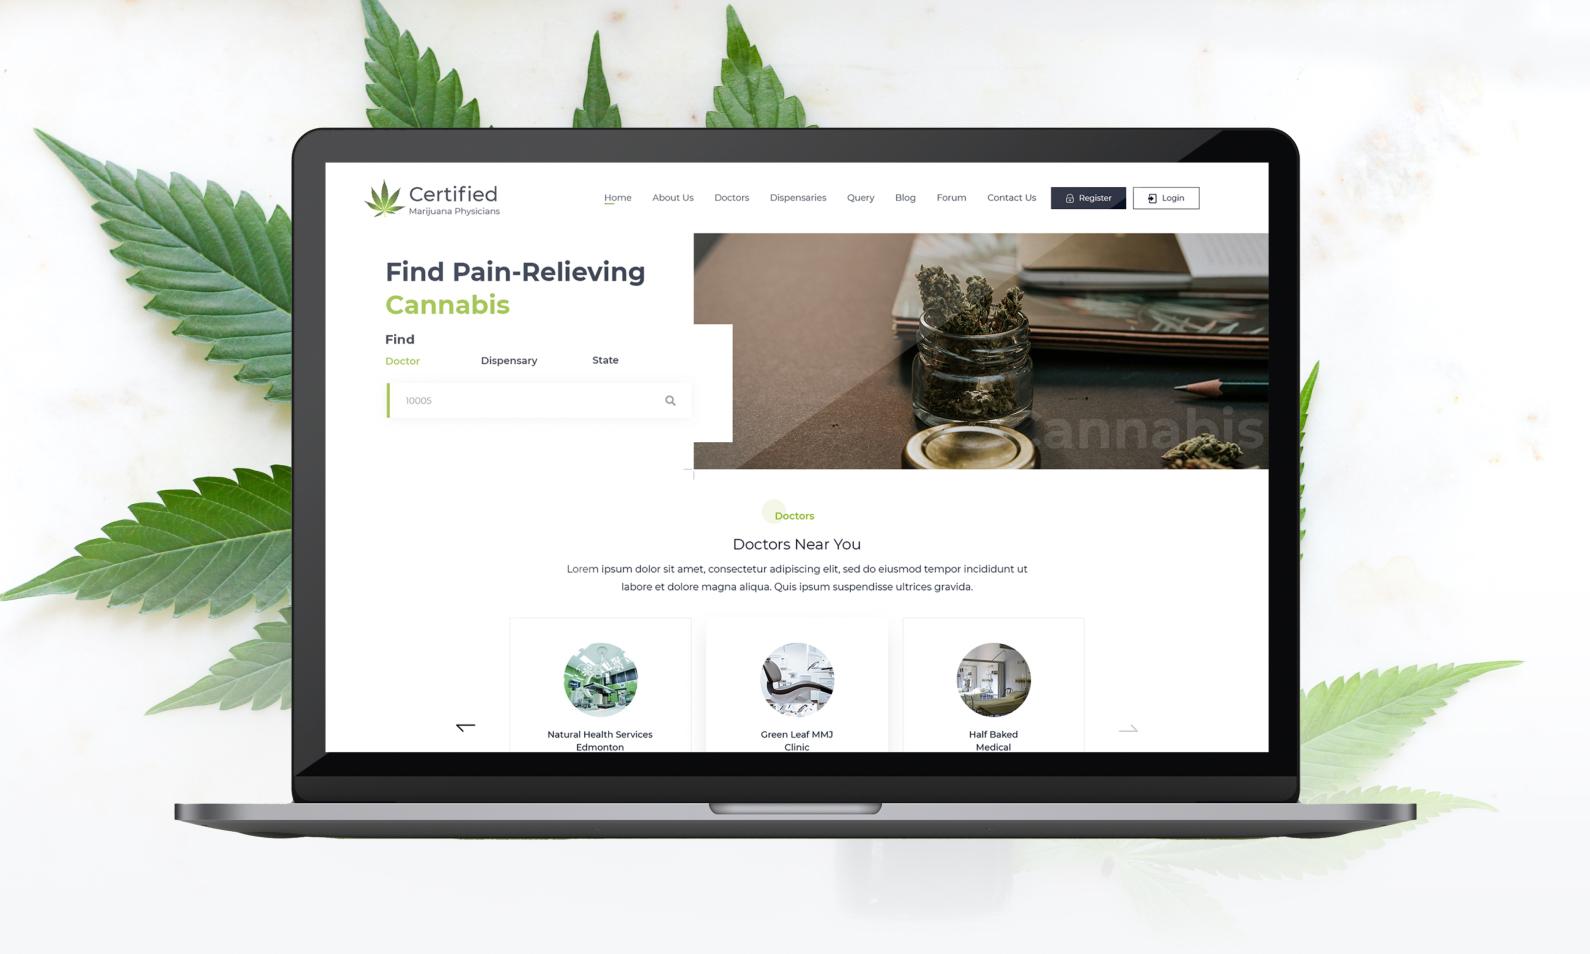 Certified Marijuana Physicians